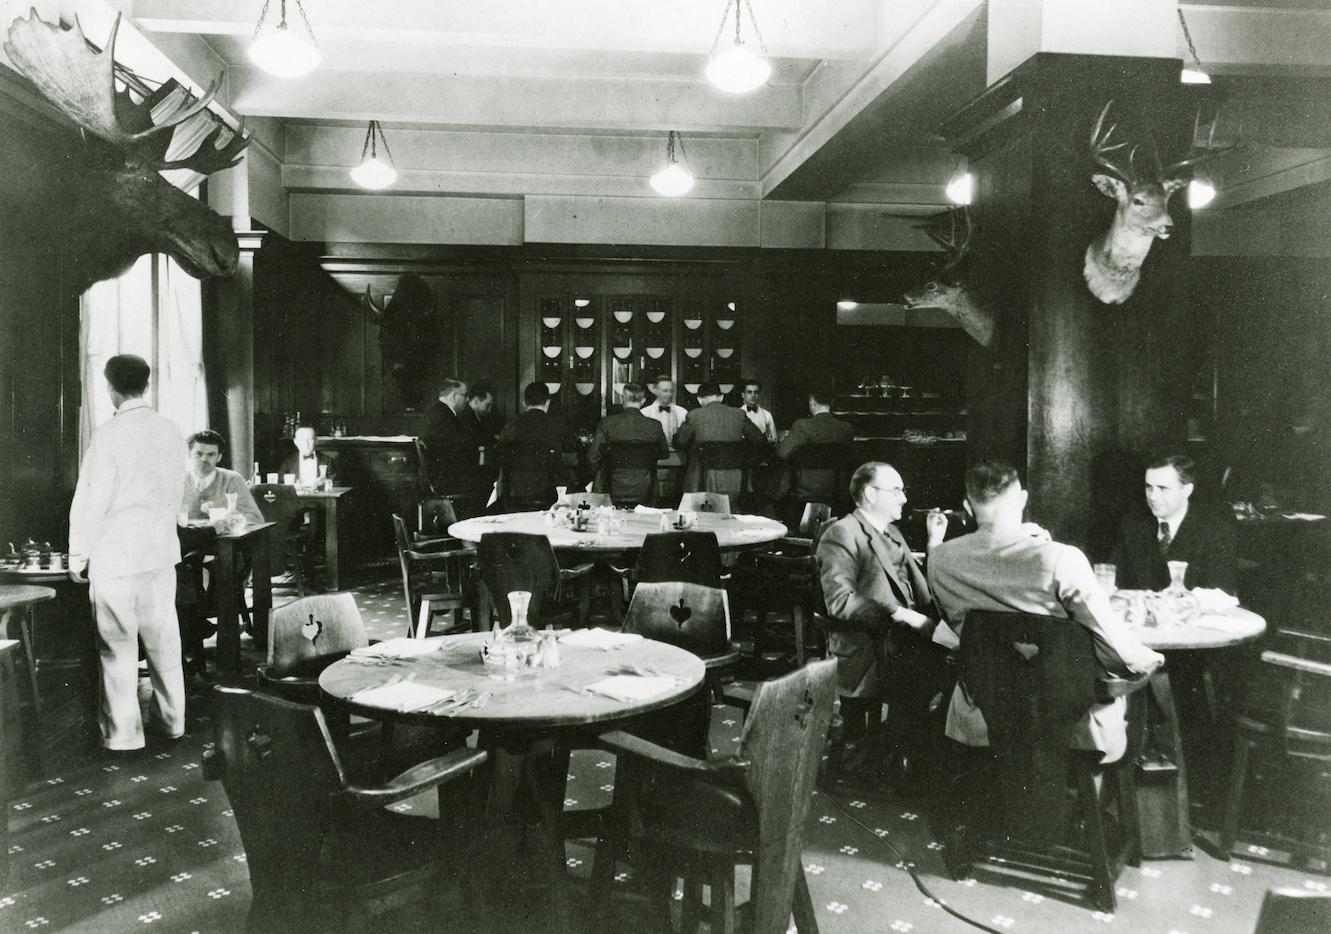 la athletic club in the 1940's